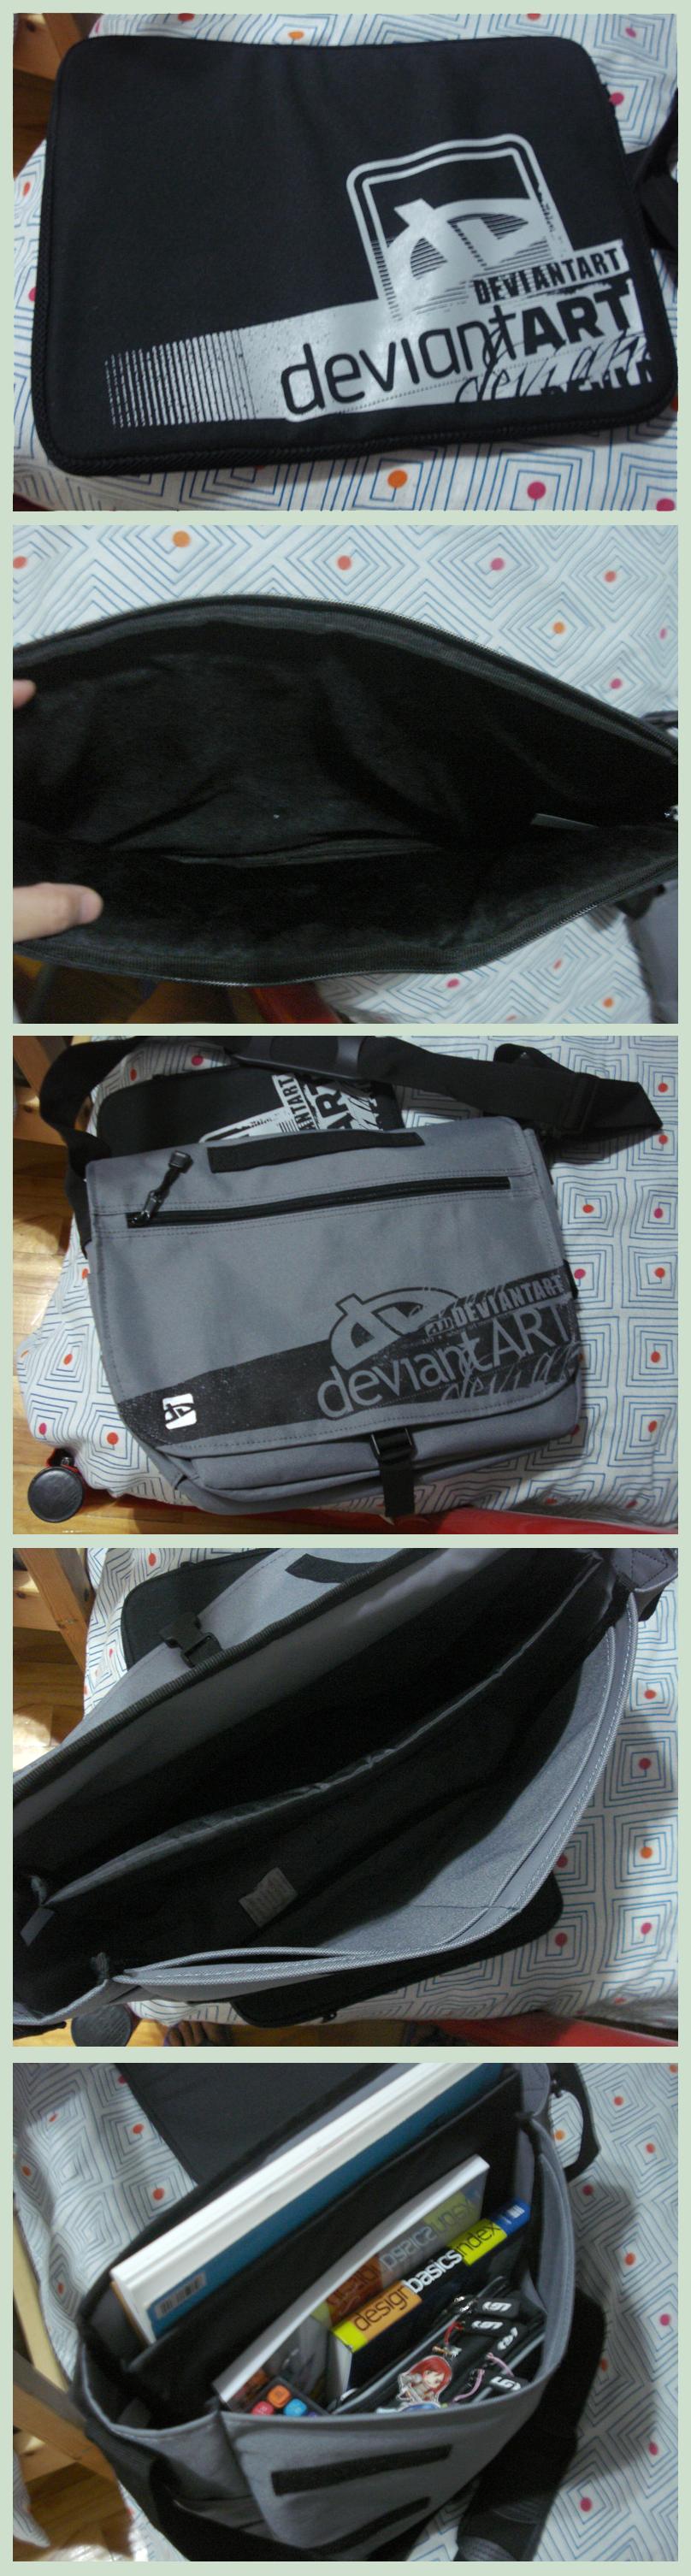 DA Messenger Bag by HanuWabbit